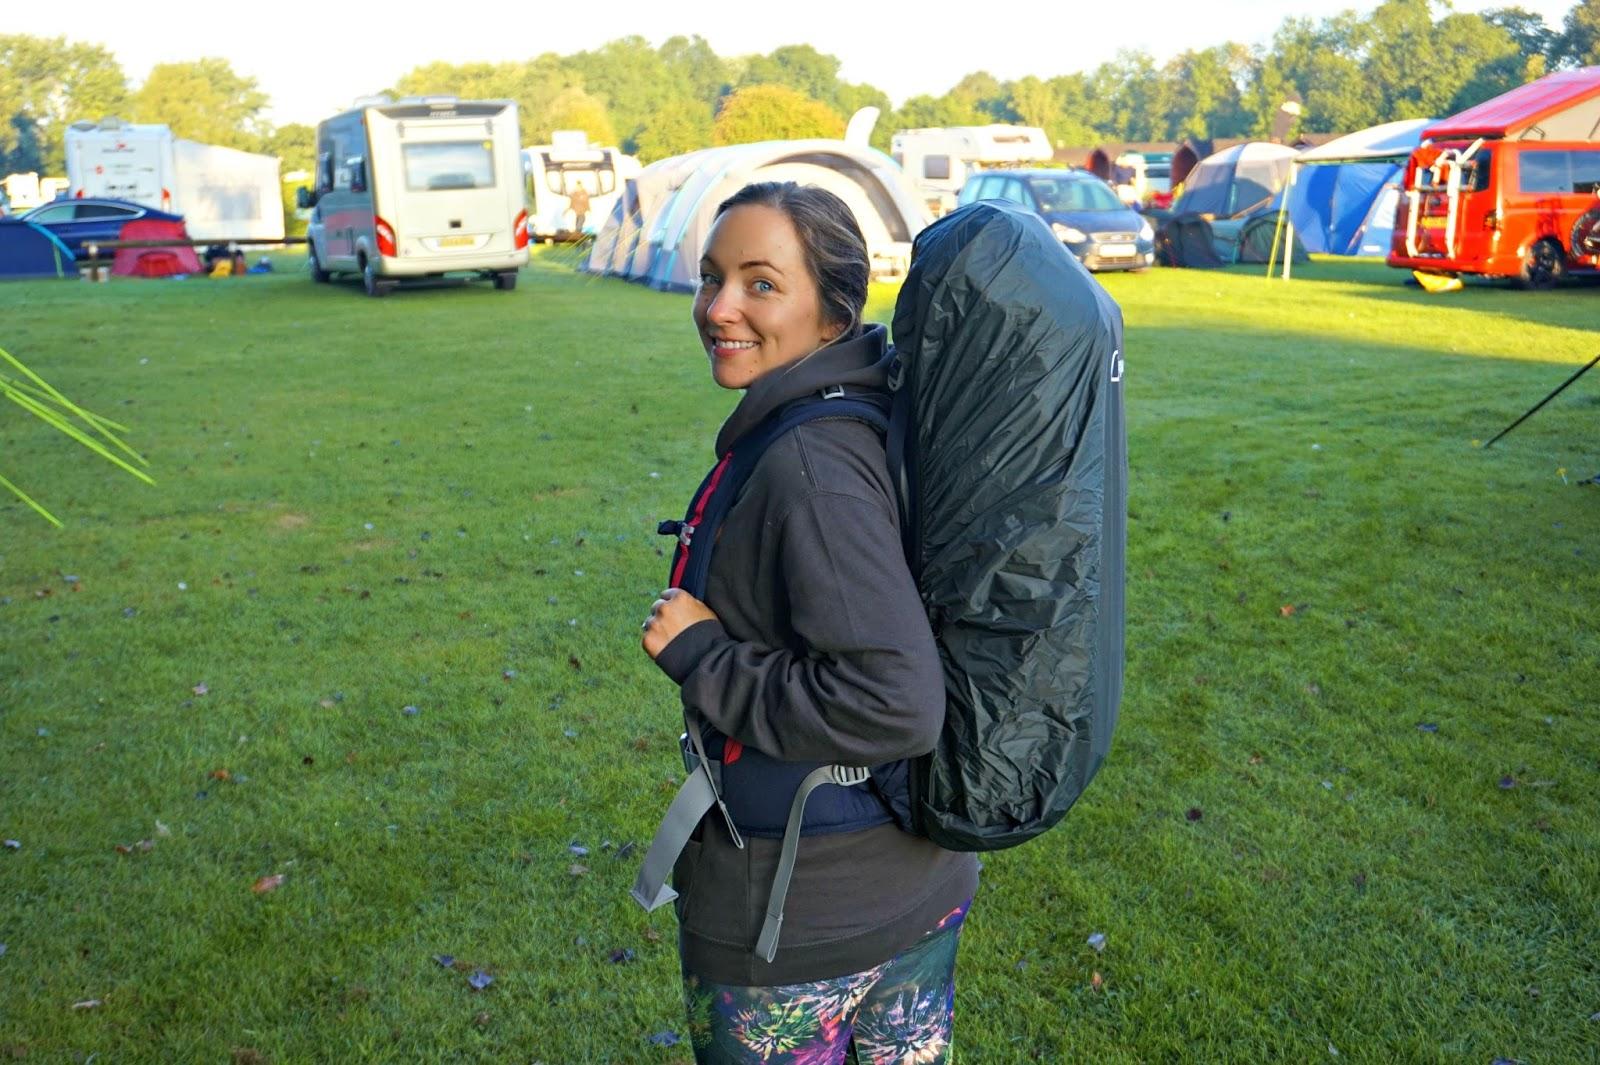 Berghaus trailhead 50 rucksack